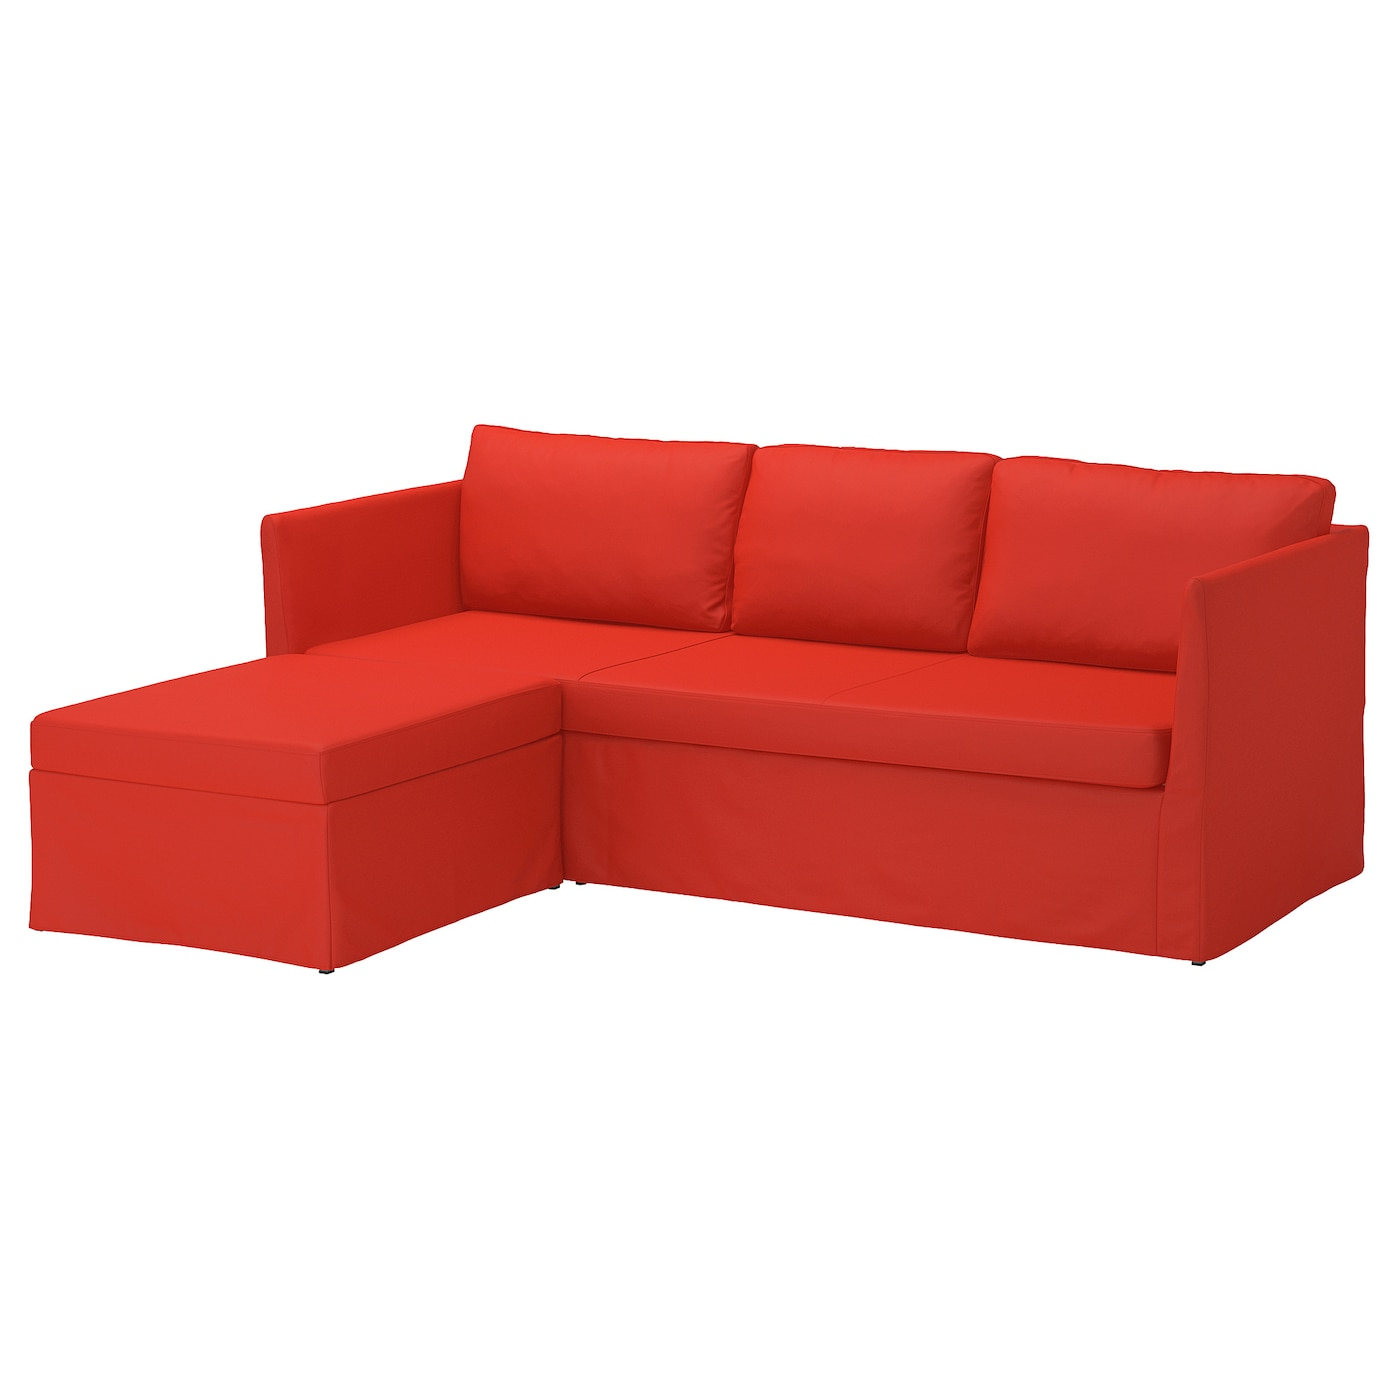 BRÅTHULT Sleeper sectional, 3-seat, Vissle red/orange